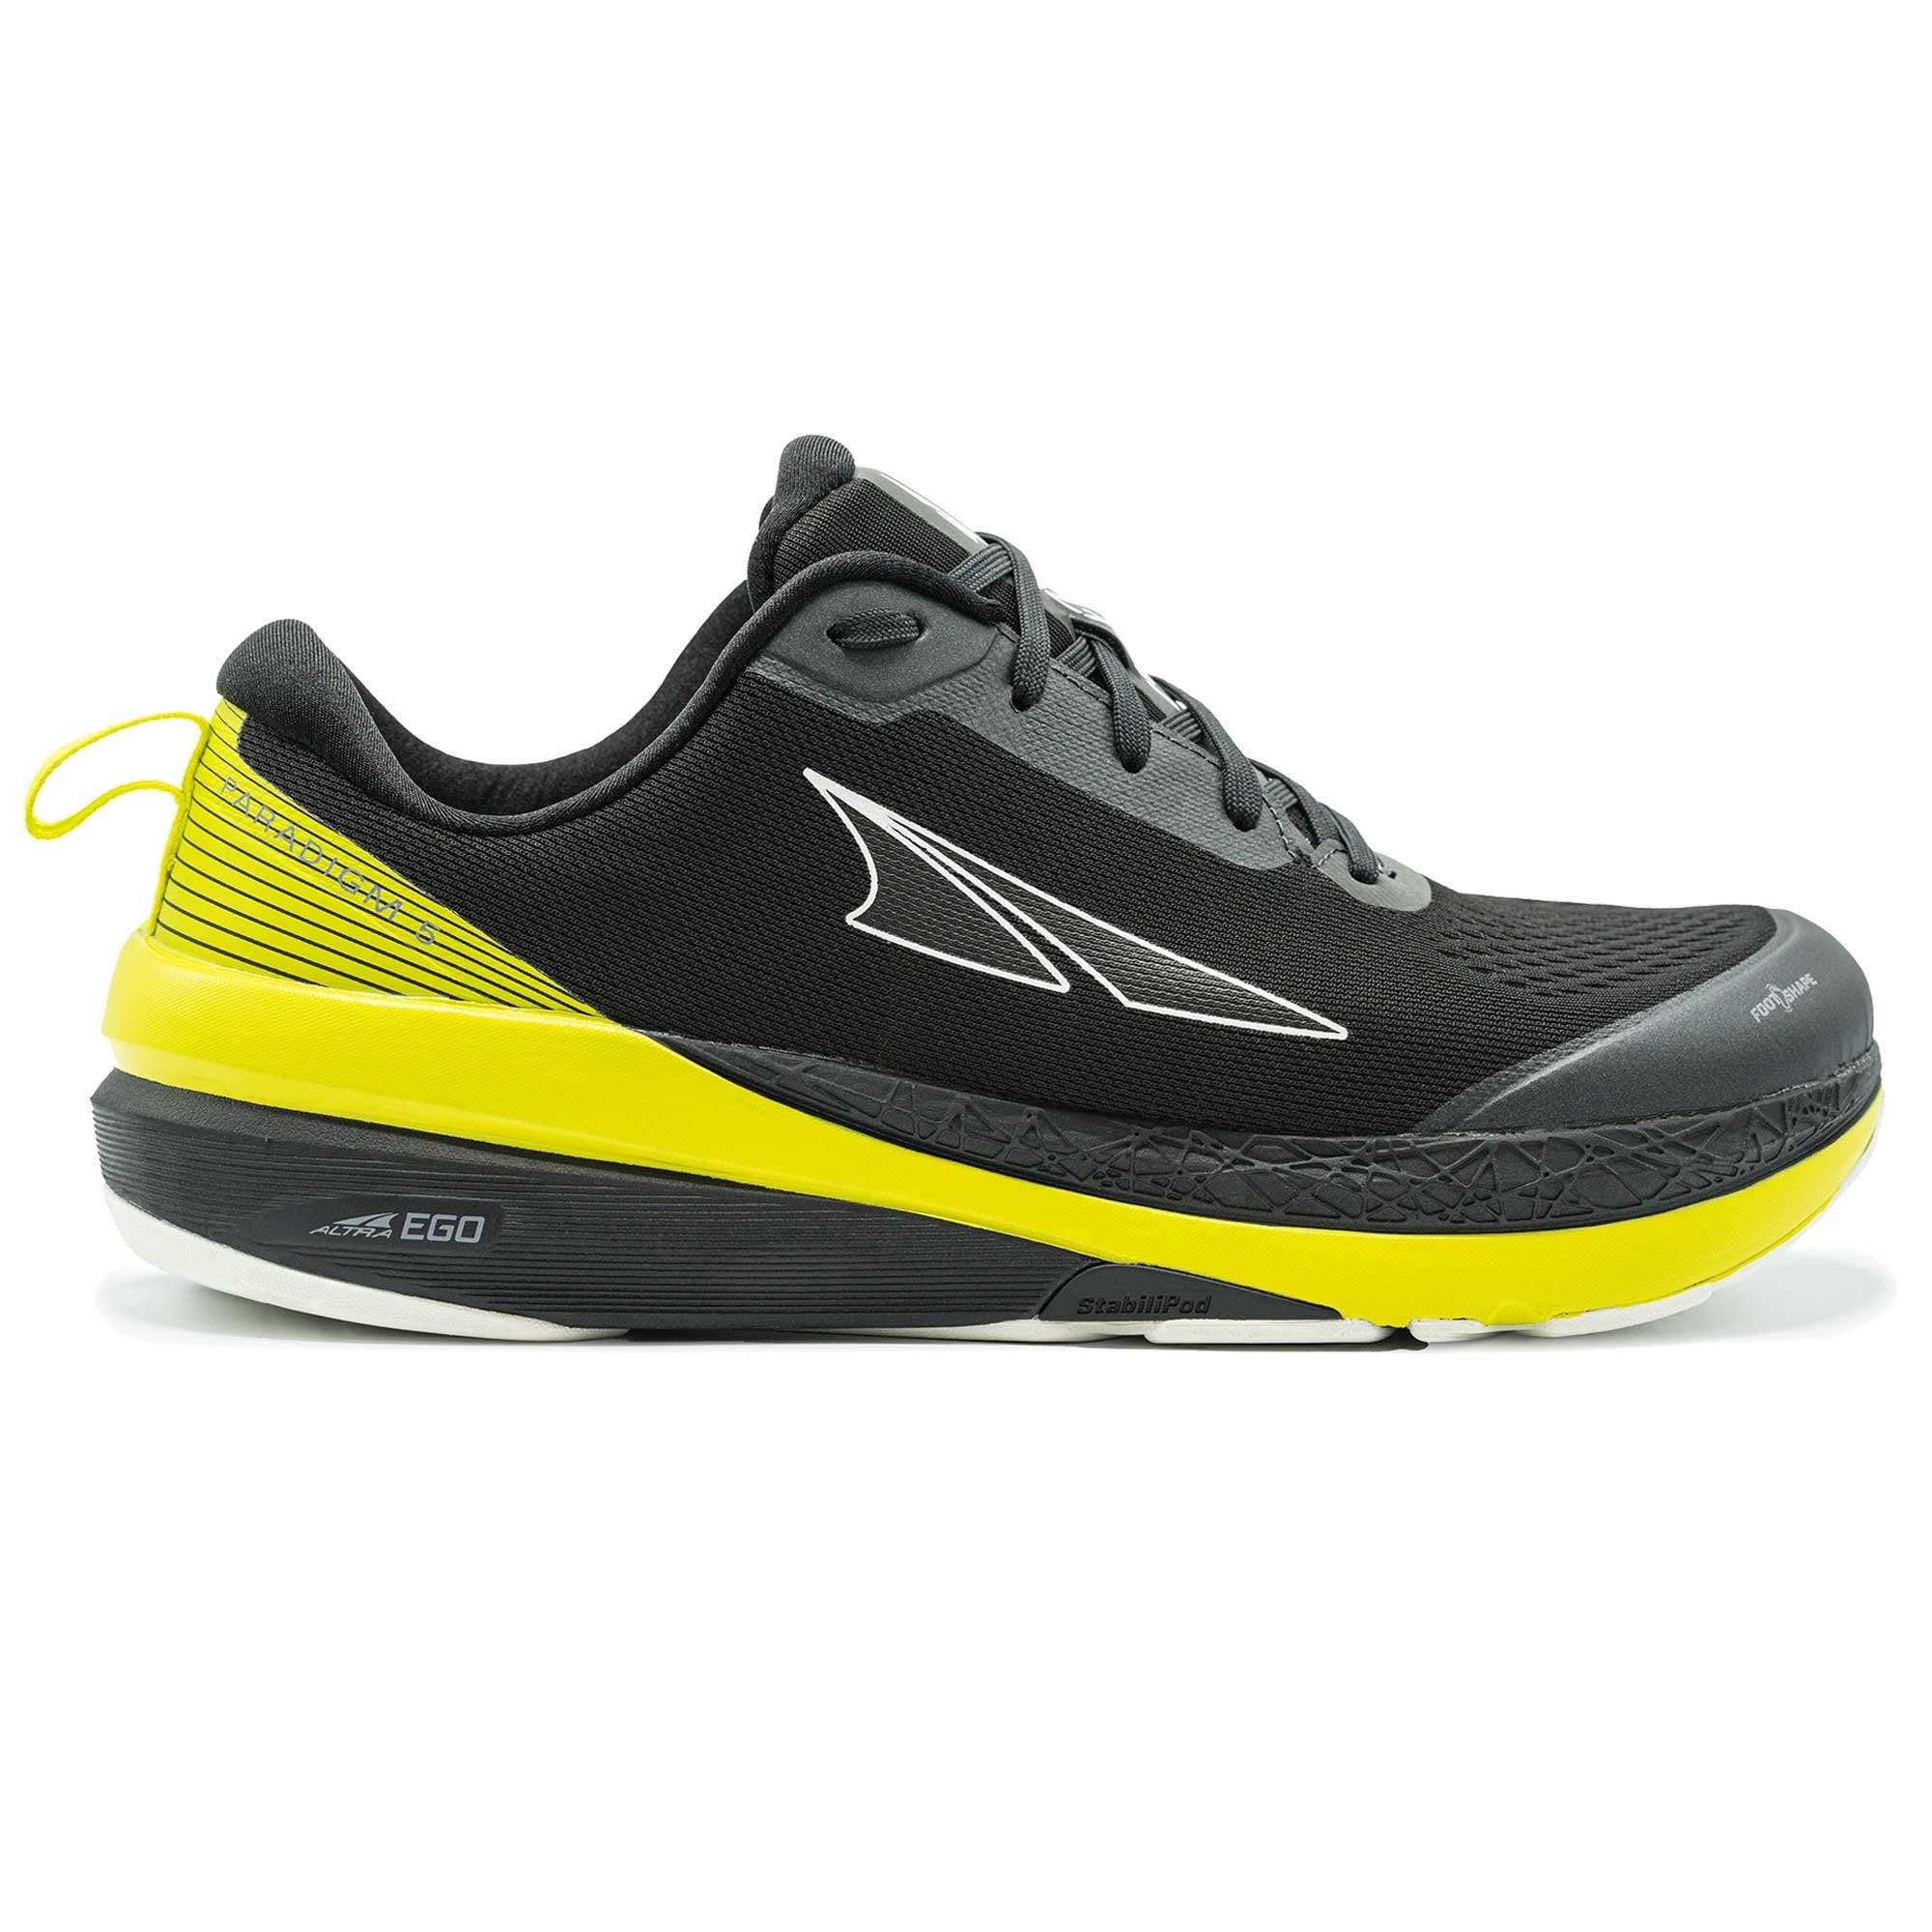 Paradigm 5 Mens Zero Drop Foot Shape Cushioned Road Running Shoes Black Lime At Northernrunner Com